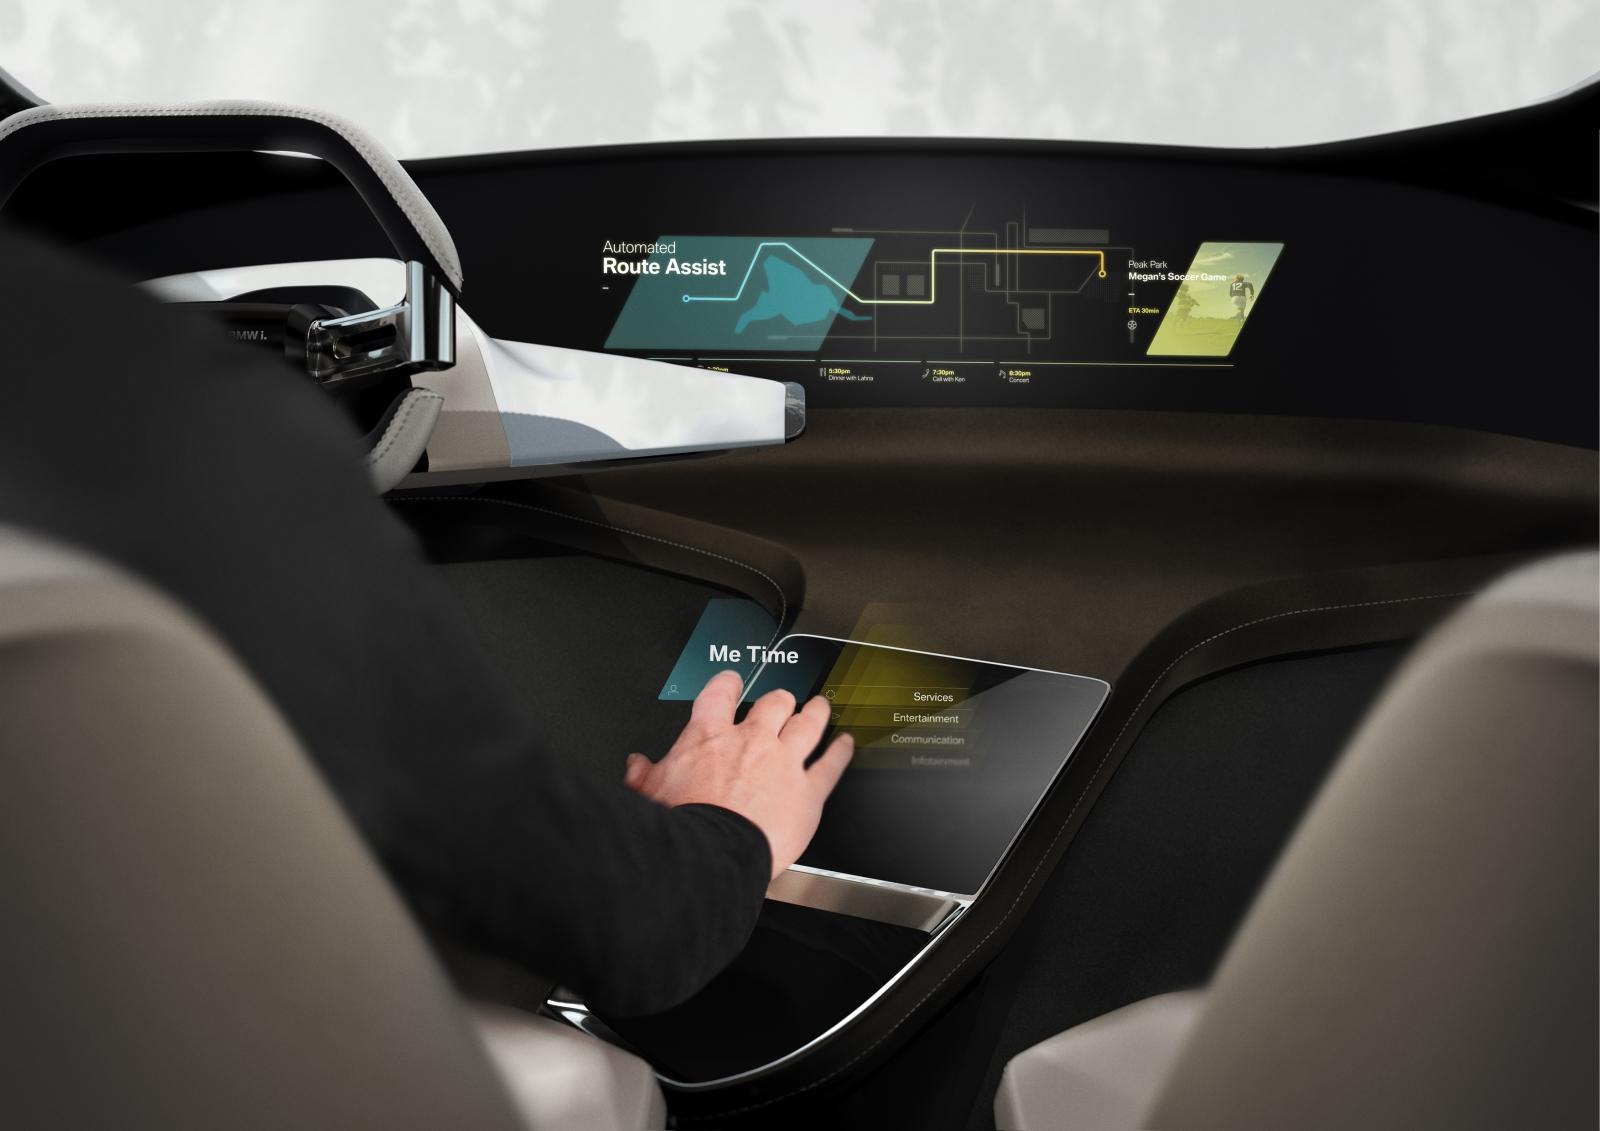 BMW car of future CES 2017